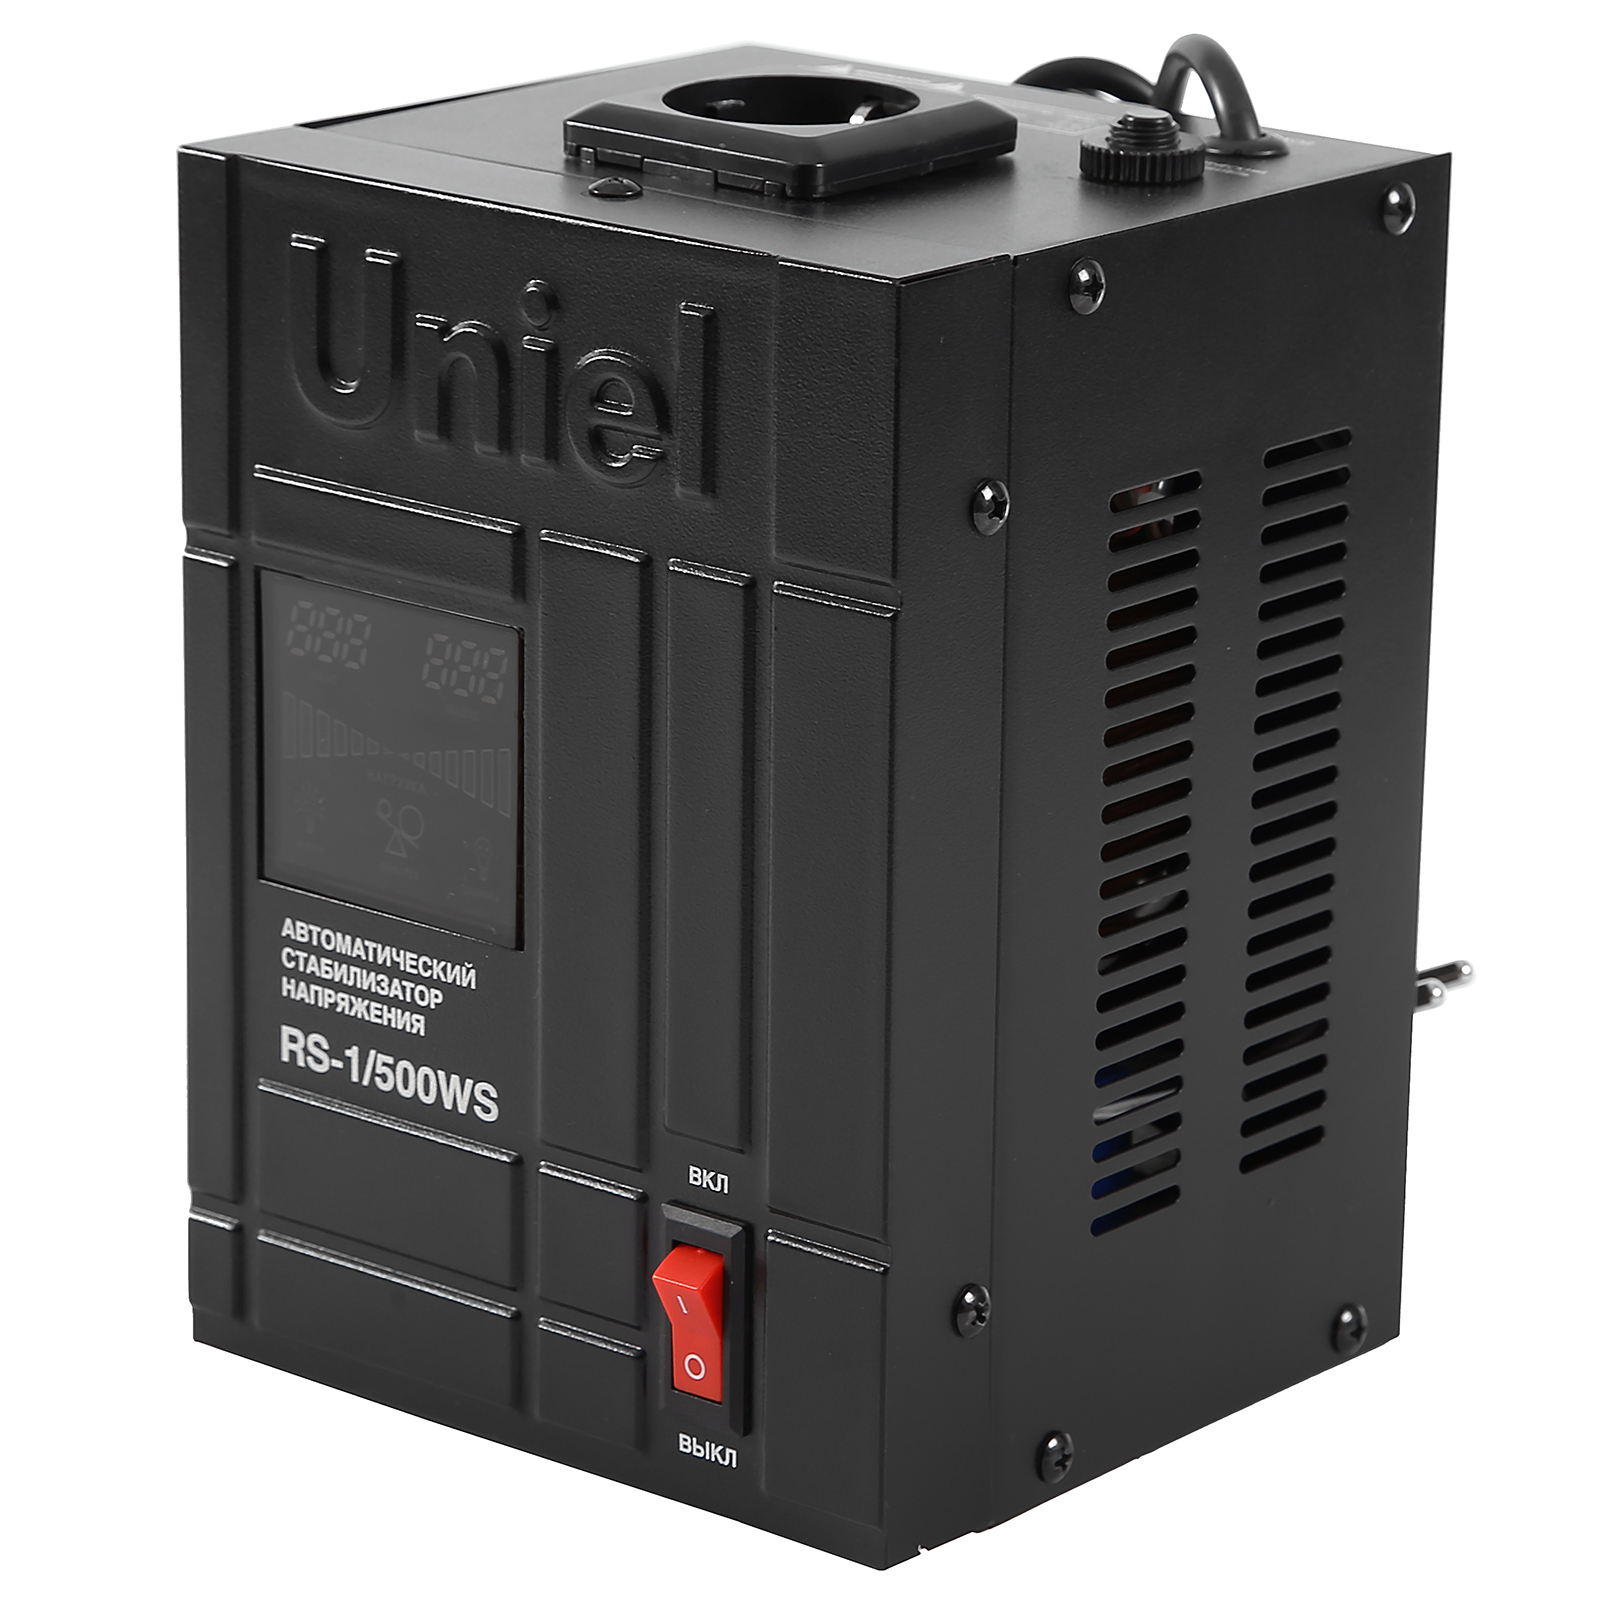 Стабилизатор напряжения Uniel Rs-1/500ws